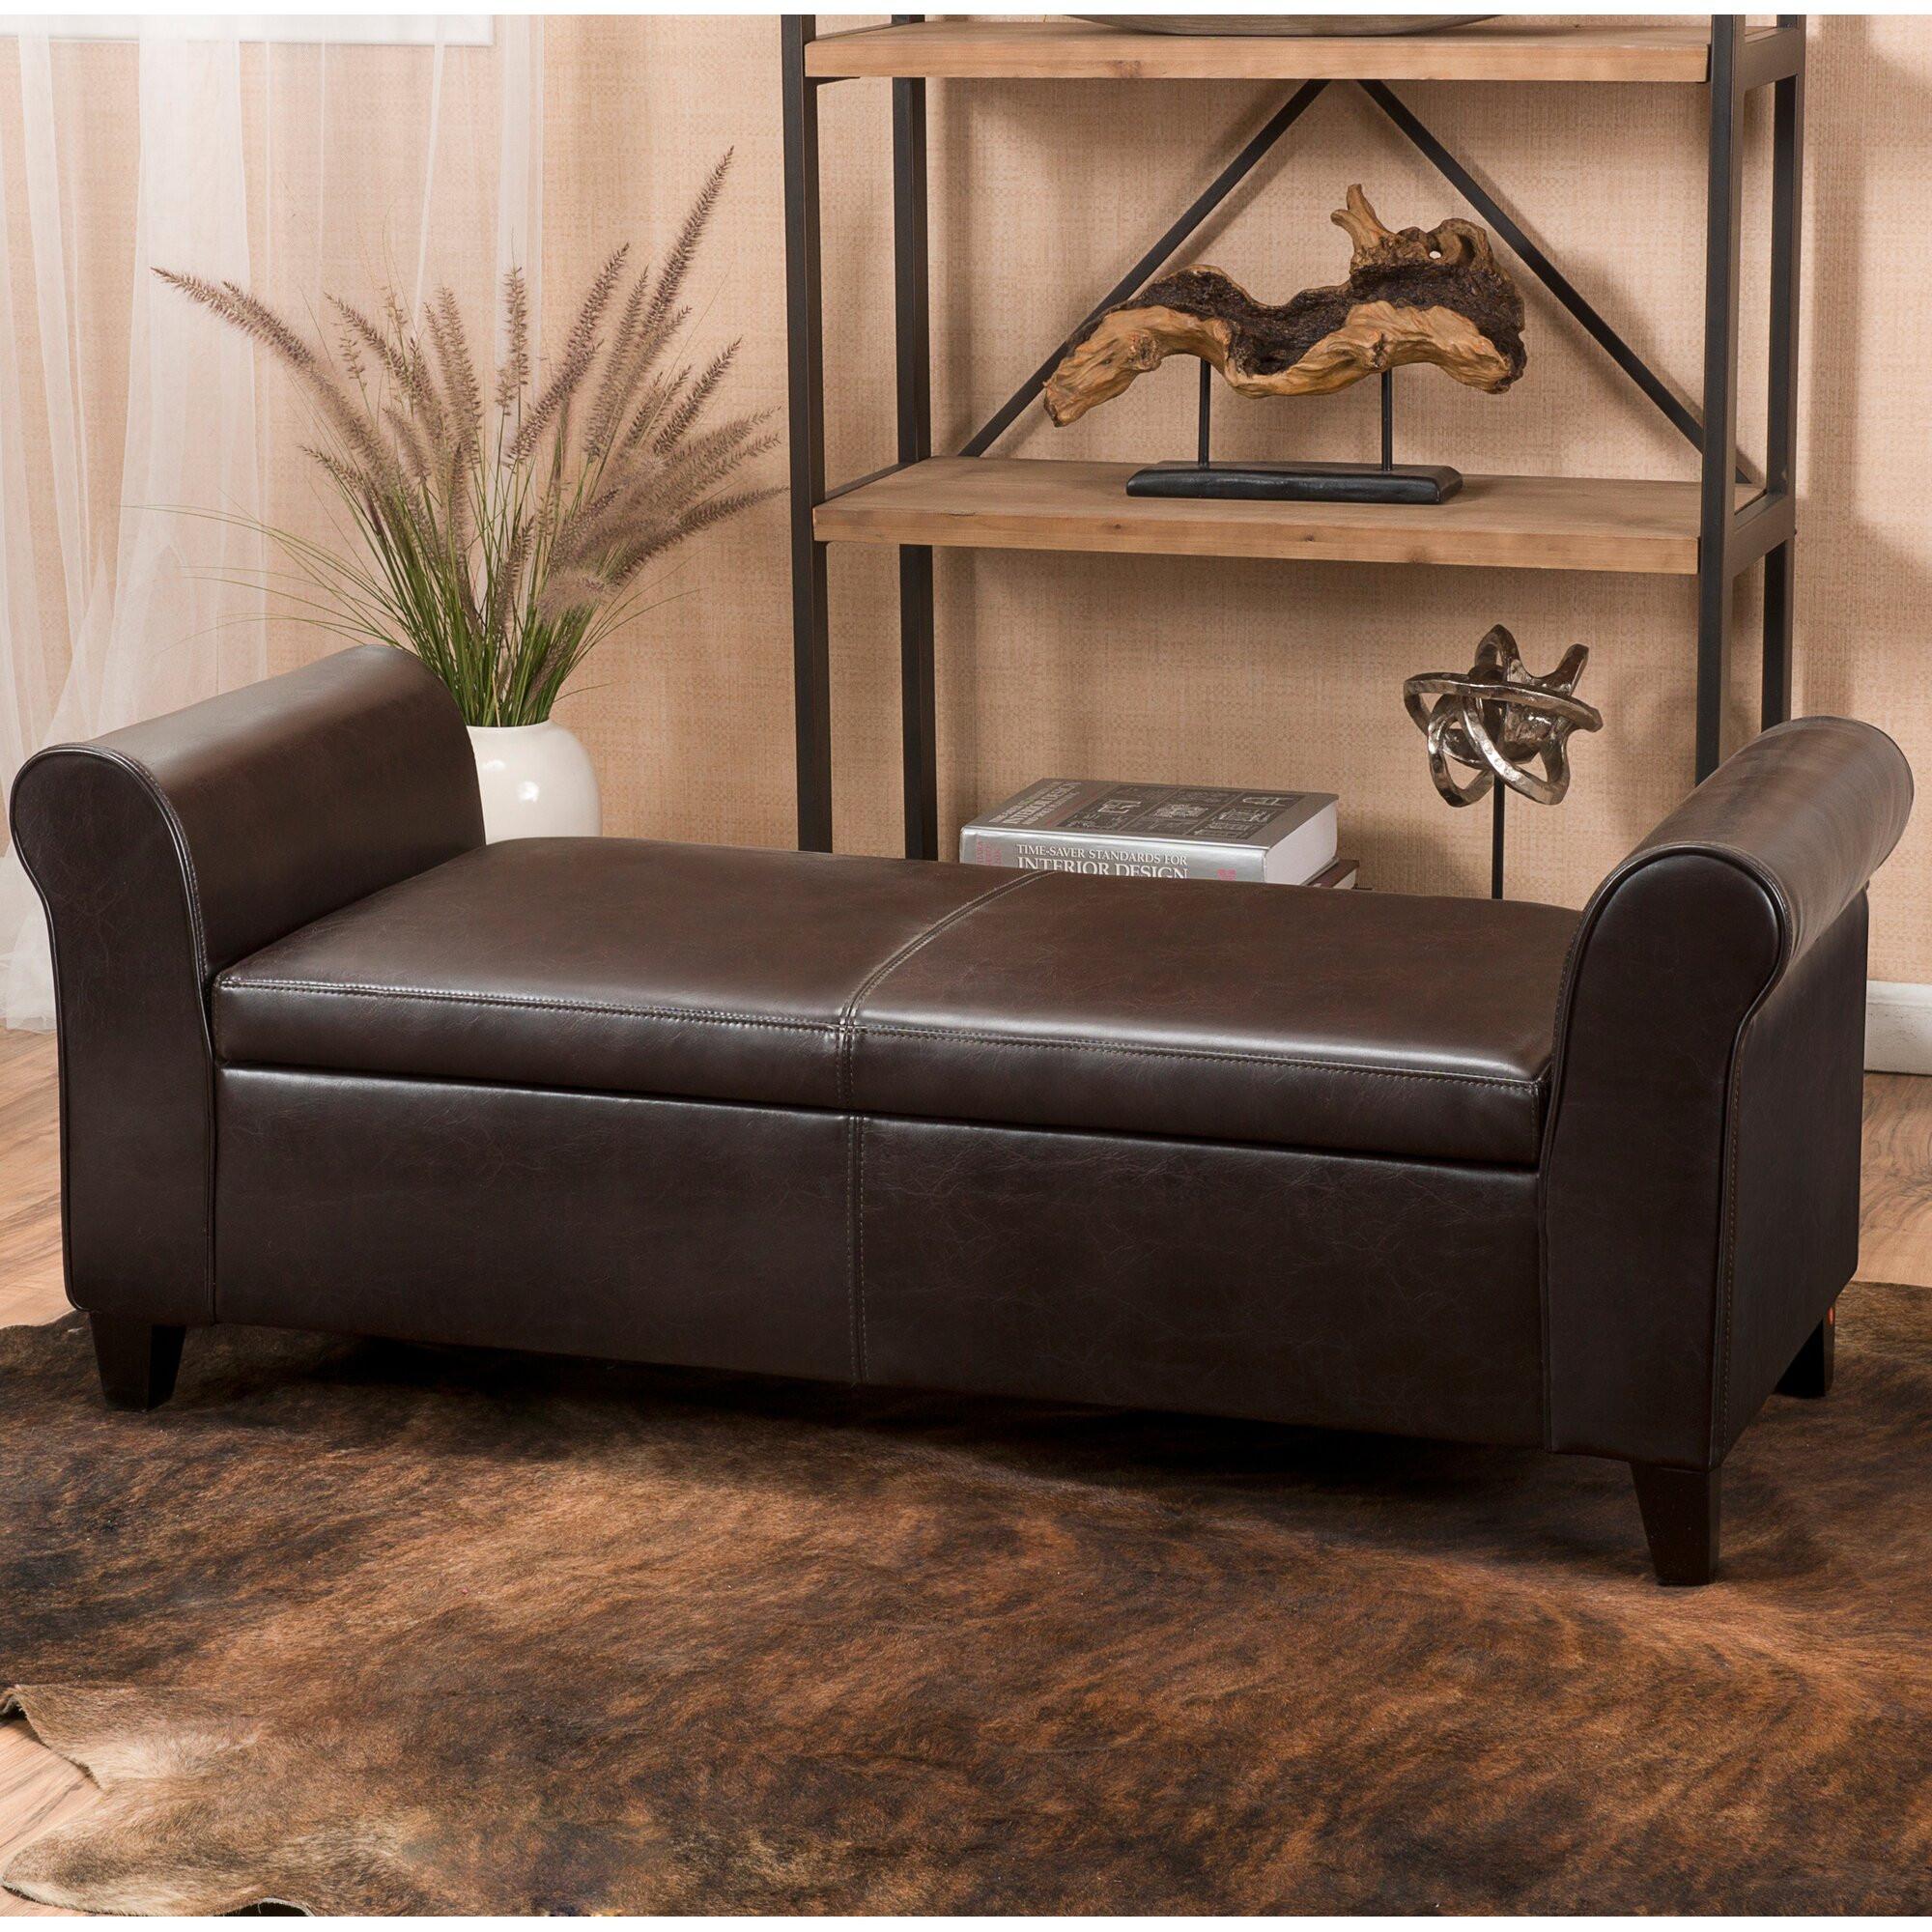 Storage Bench Bedroom  Varian Upholstered Storage Bedroom Bench & Reviews